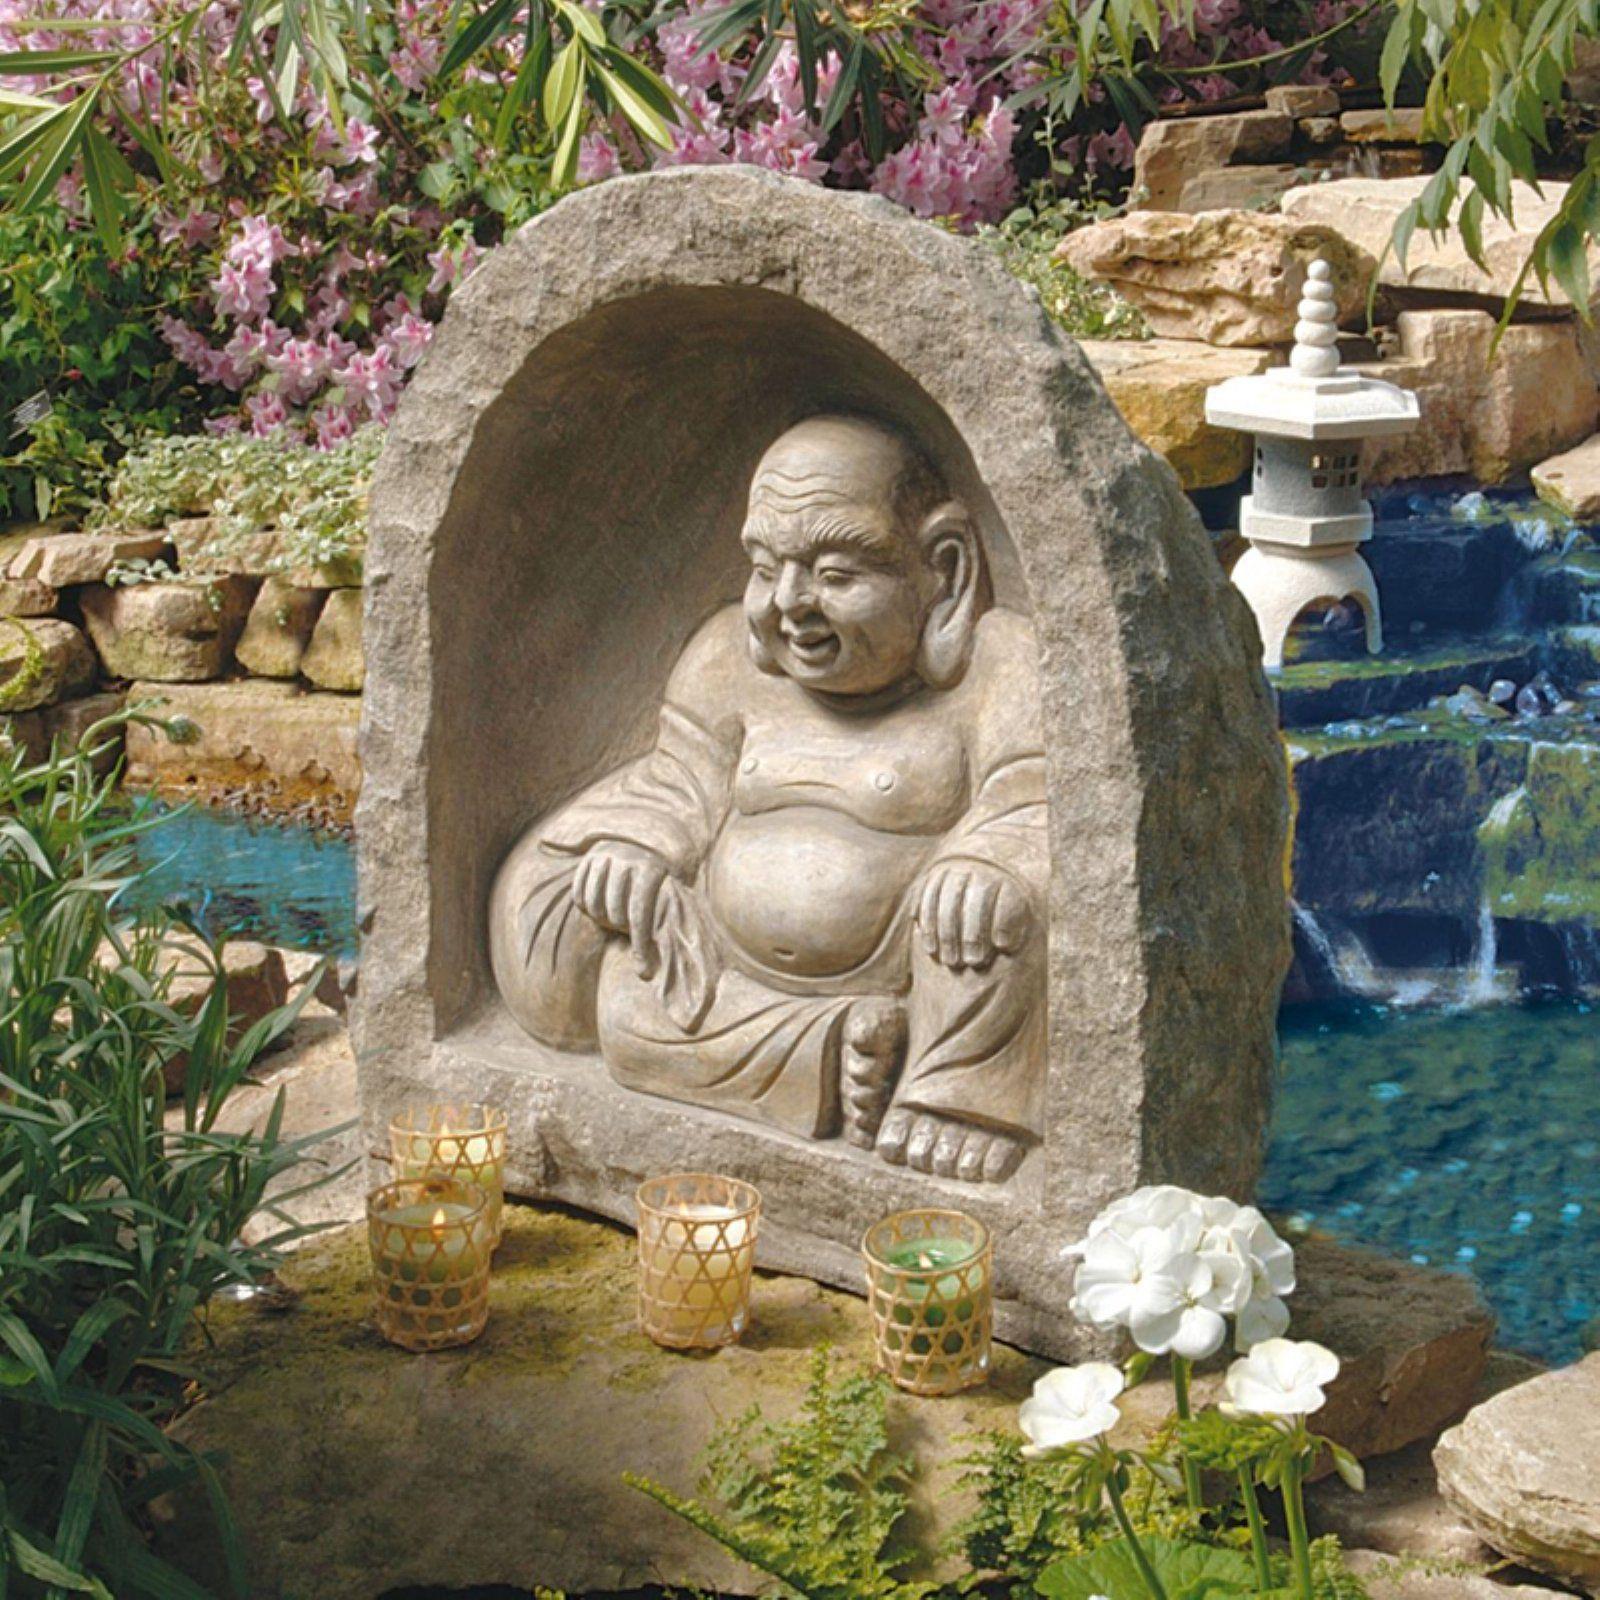 The Great Buddha Garden Sanctuary Sculpture Buddha Garden Buddha Sculpture Garden Statues